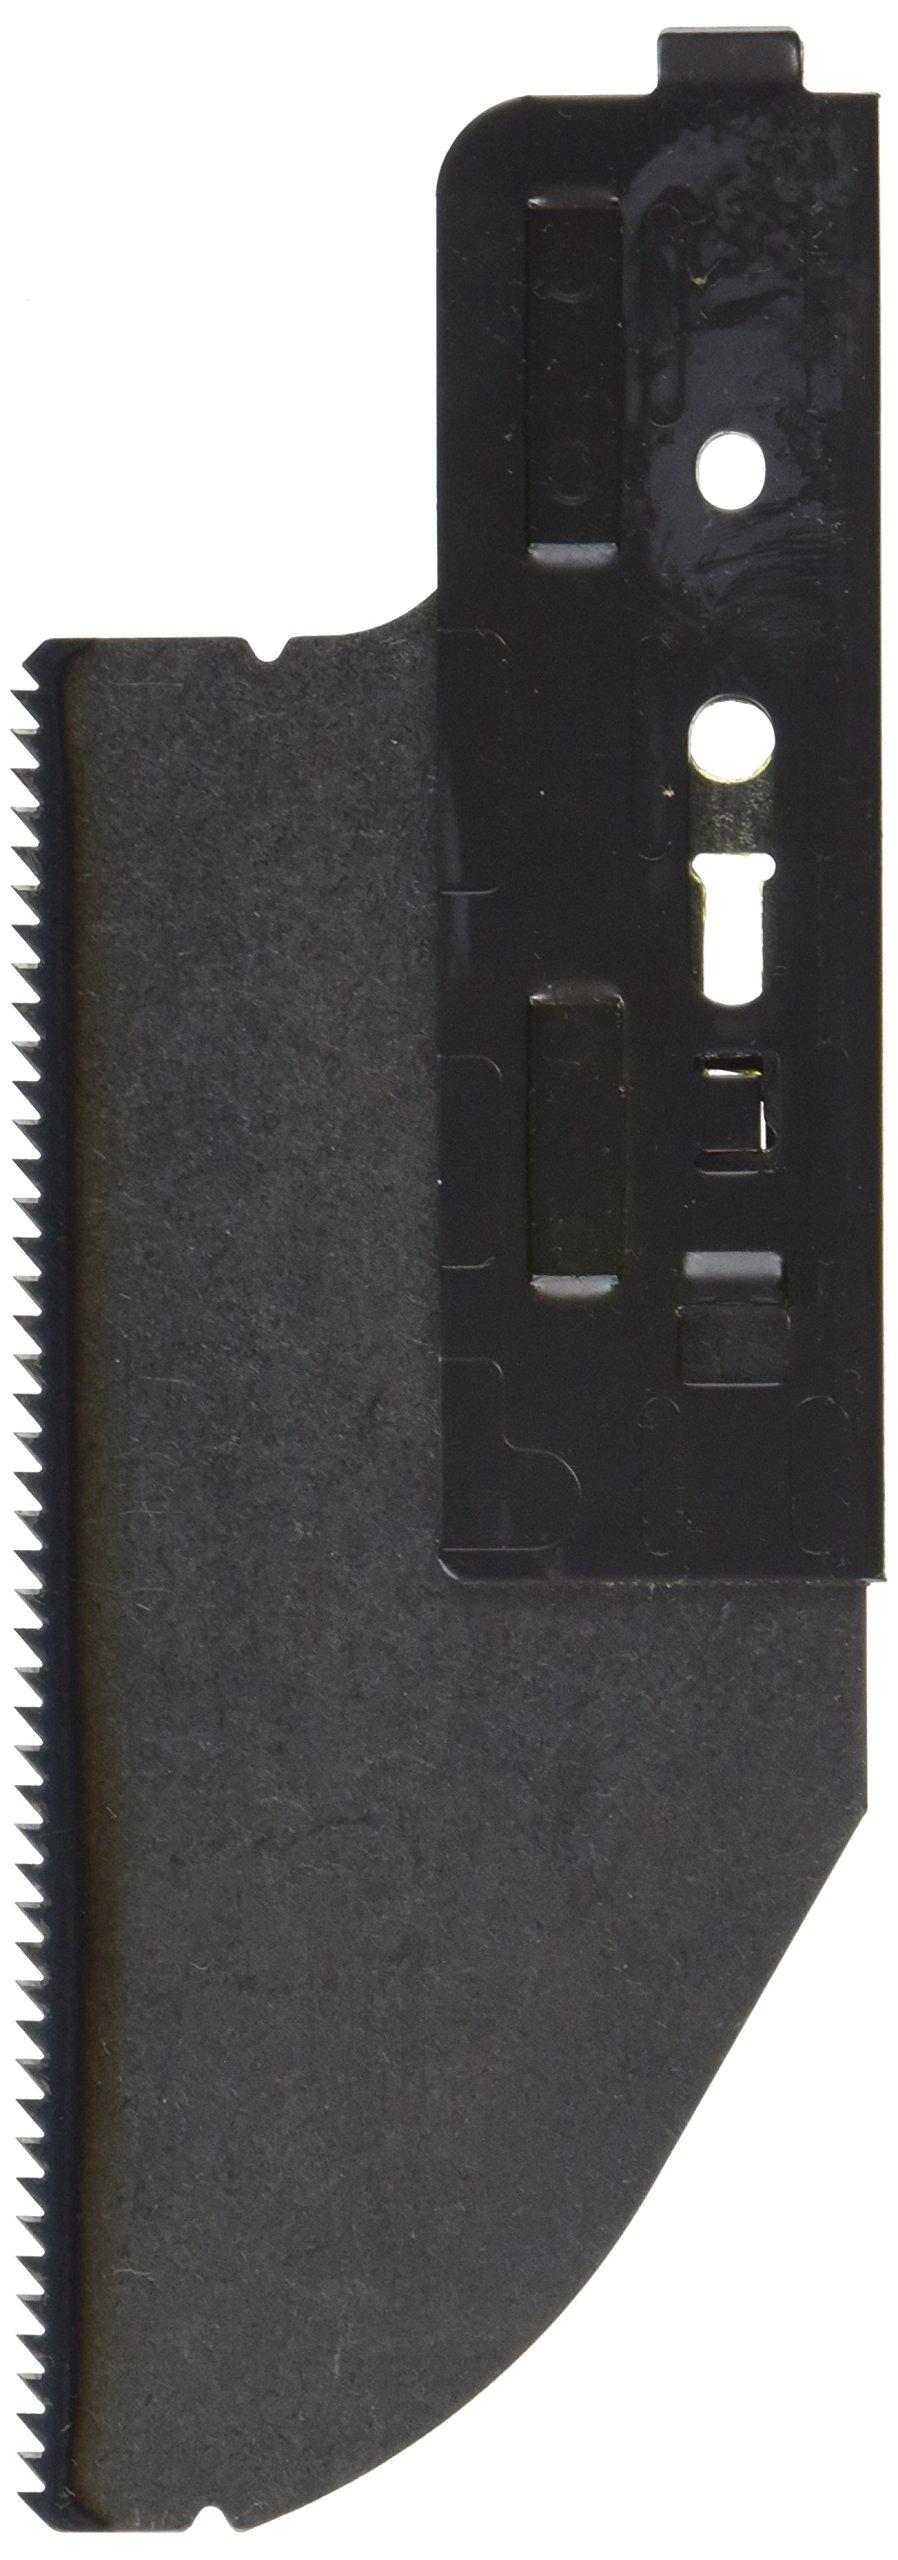 Bosch FS180DTU 5-3/4 In. 8 TPI Regular Cut FineCut High-Alloy Steel Power Handsaw Blade by Bosch (Image #1)